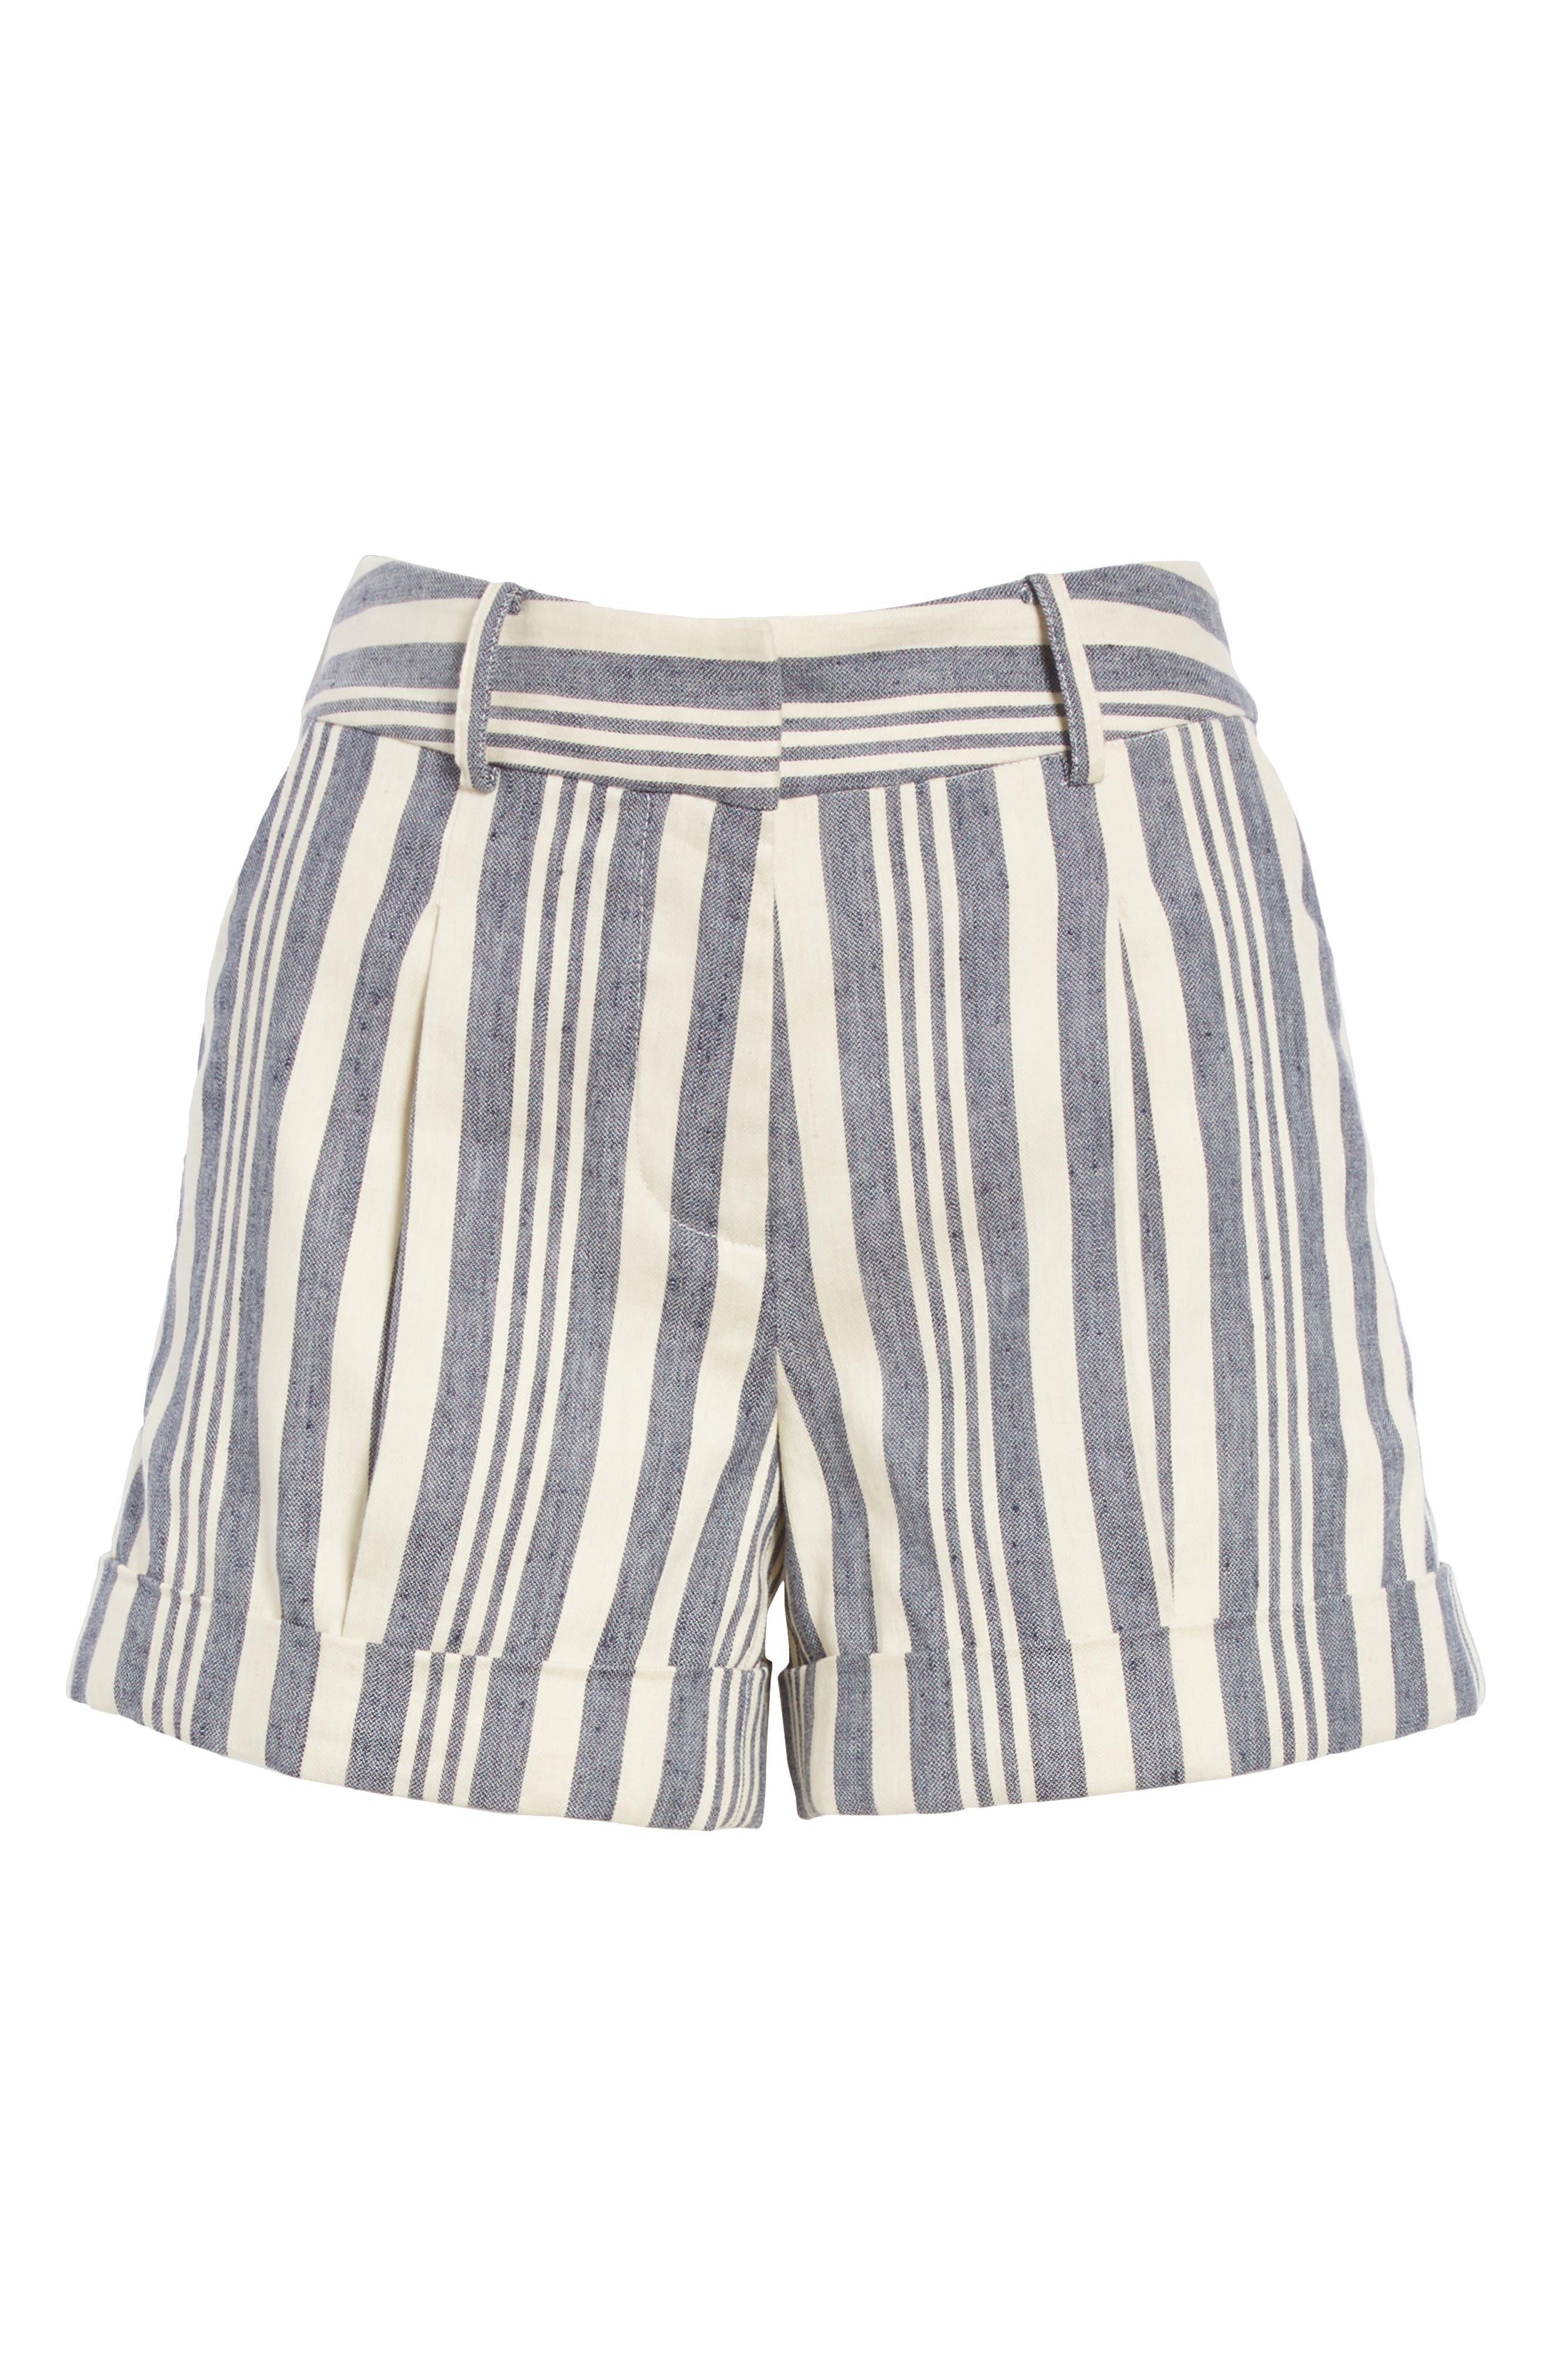 Carito Stripe Linen & Cotton Shorts,                             Alternate thumbnail 6, color,                             413